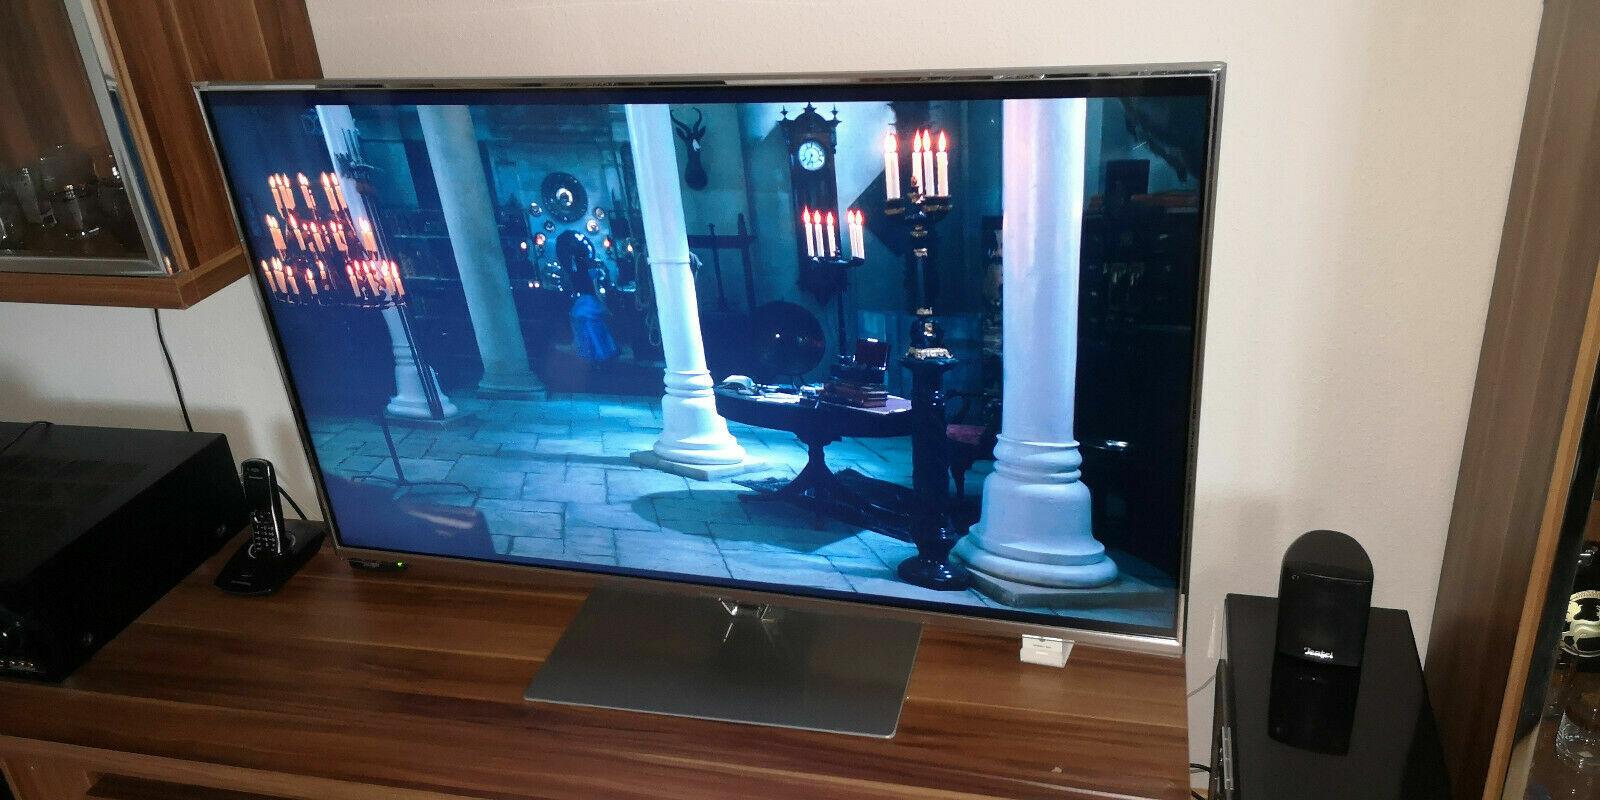 Panasonic Smart Viera TX-L47DTW60 119,4 cm (47 Zoll) 3D 1080p HD IPS LED